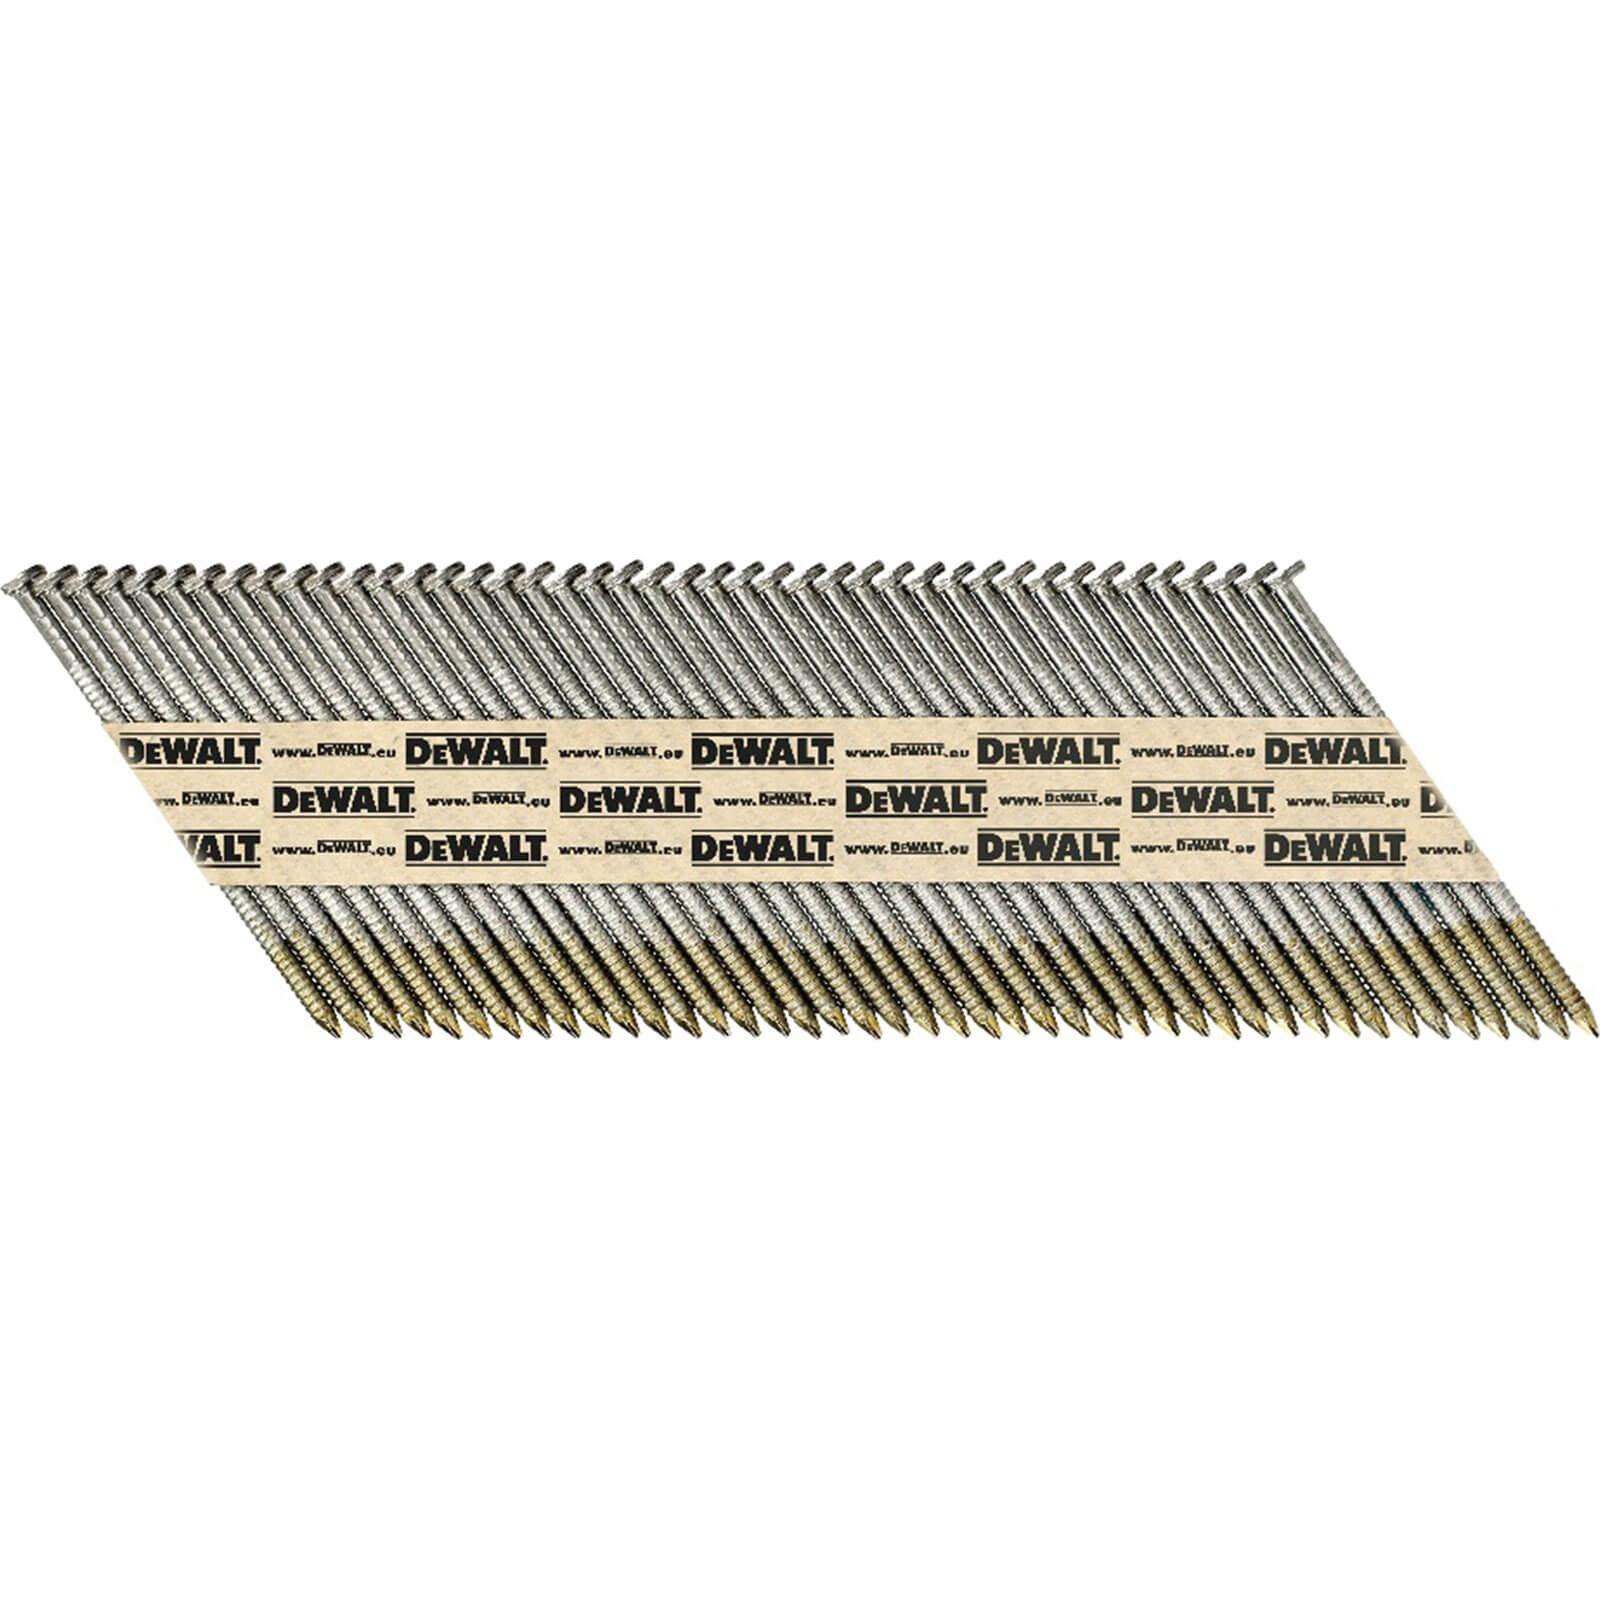 DeWalt Ring Shank Stainless Steel 34 Degree Nails